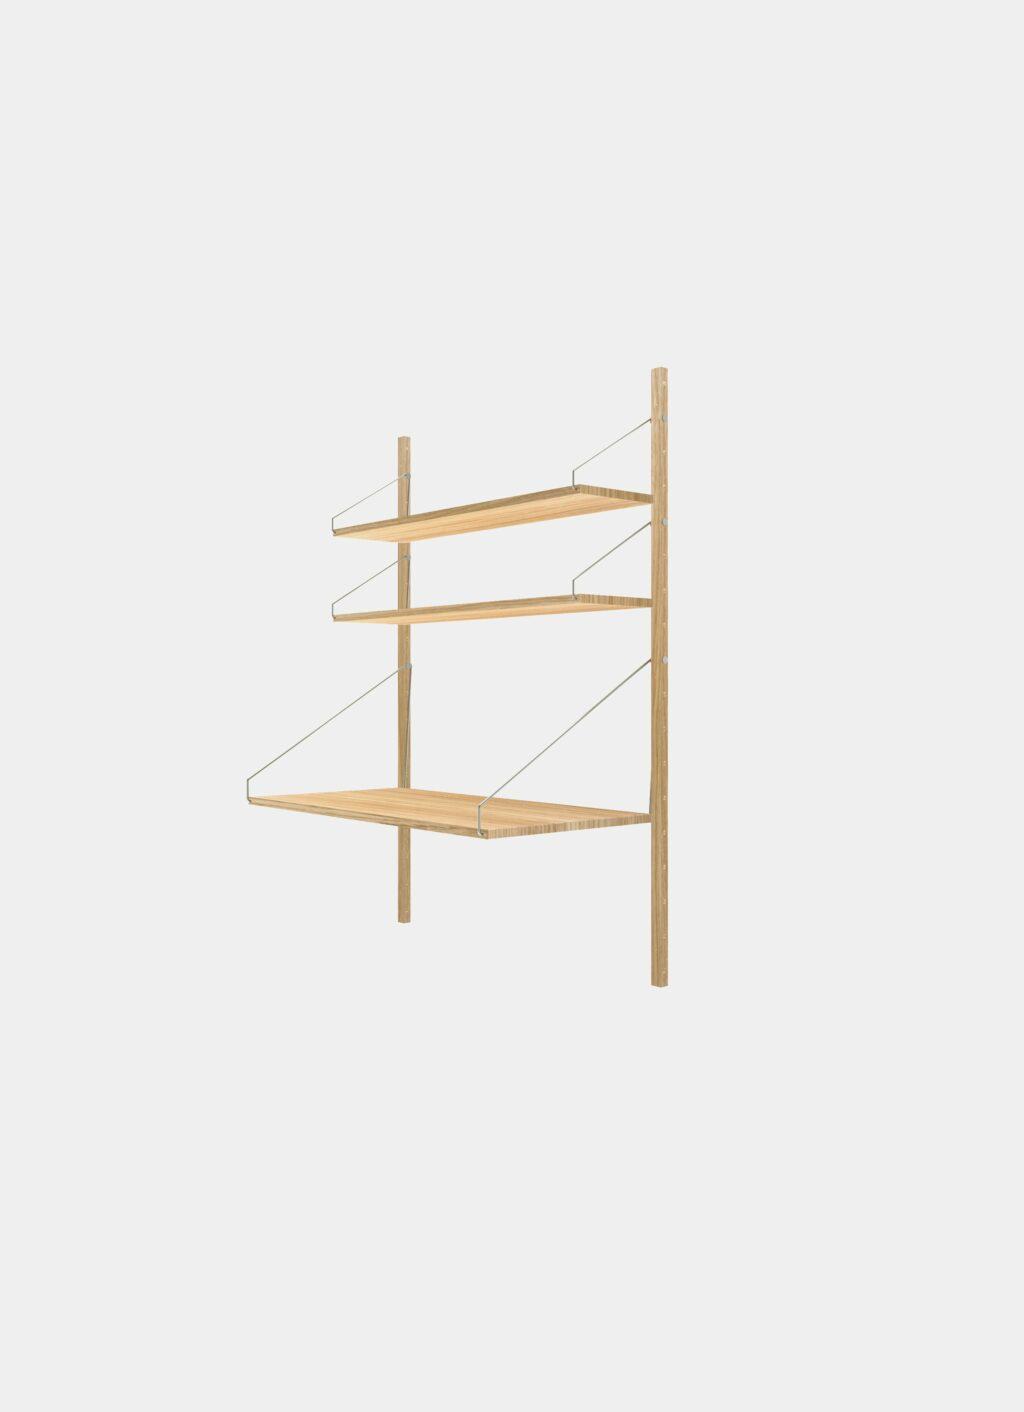 Frama - Shelf Library - Natural - H1148 - Desk Section